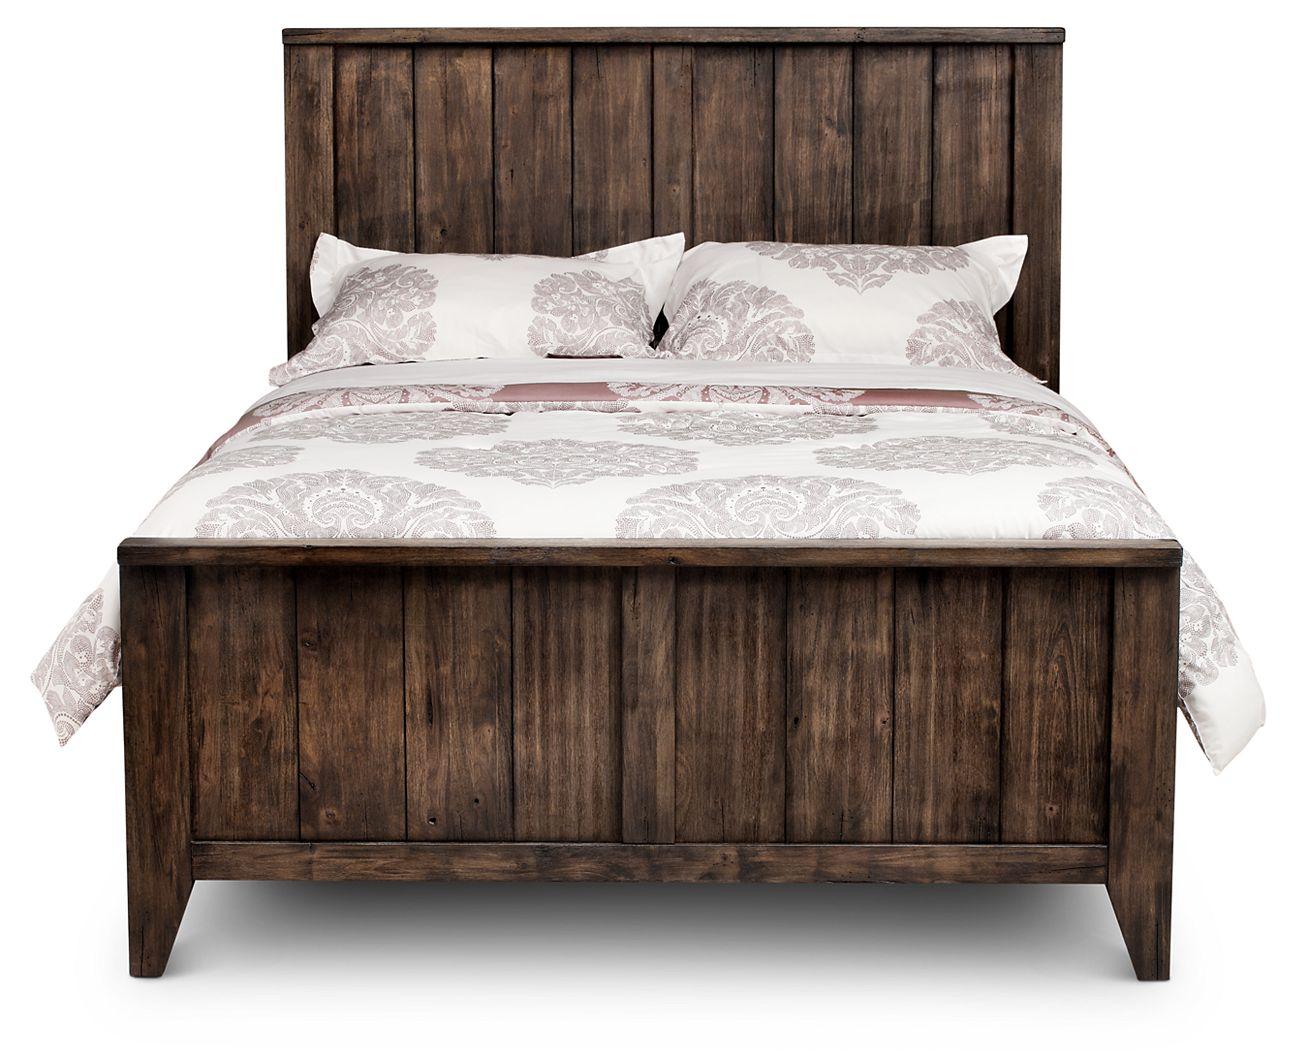 Nantucket 2 seat slipcover queen sleeper sofa rowe furniture rowe - Glenwood Panel Bed